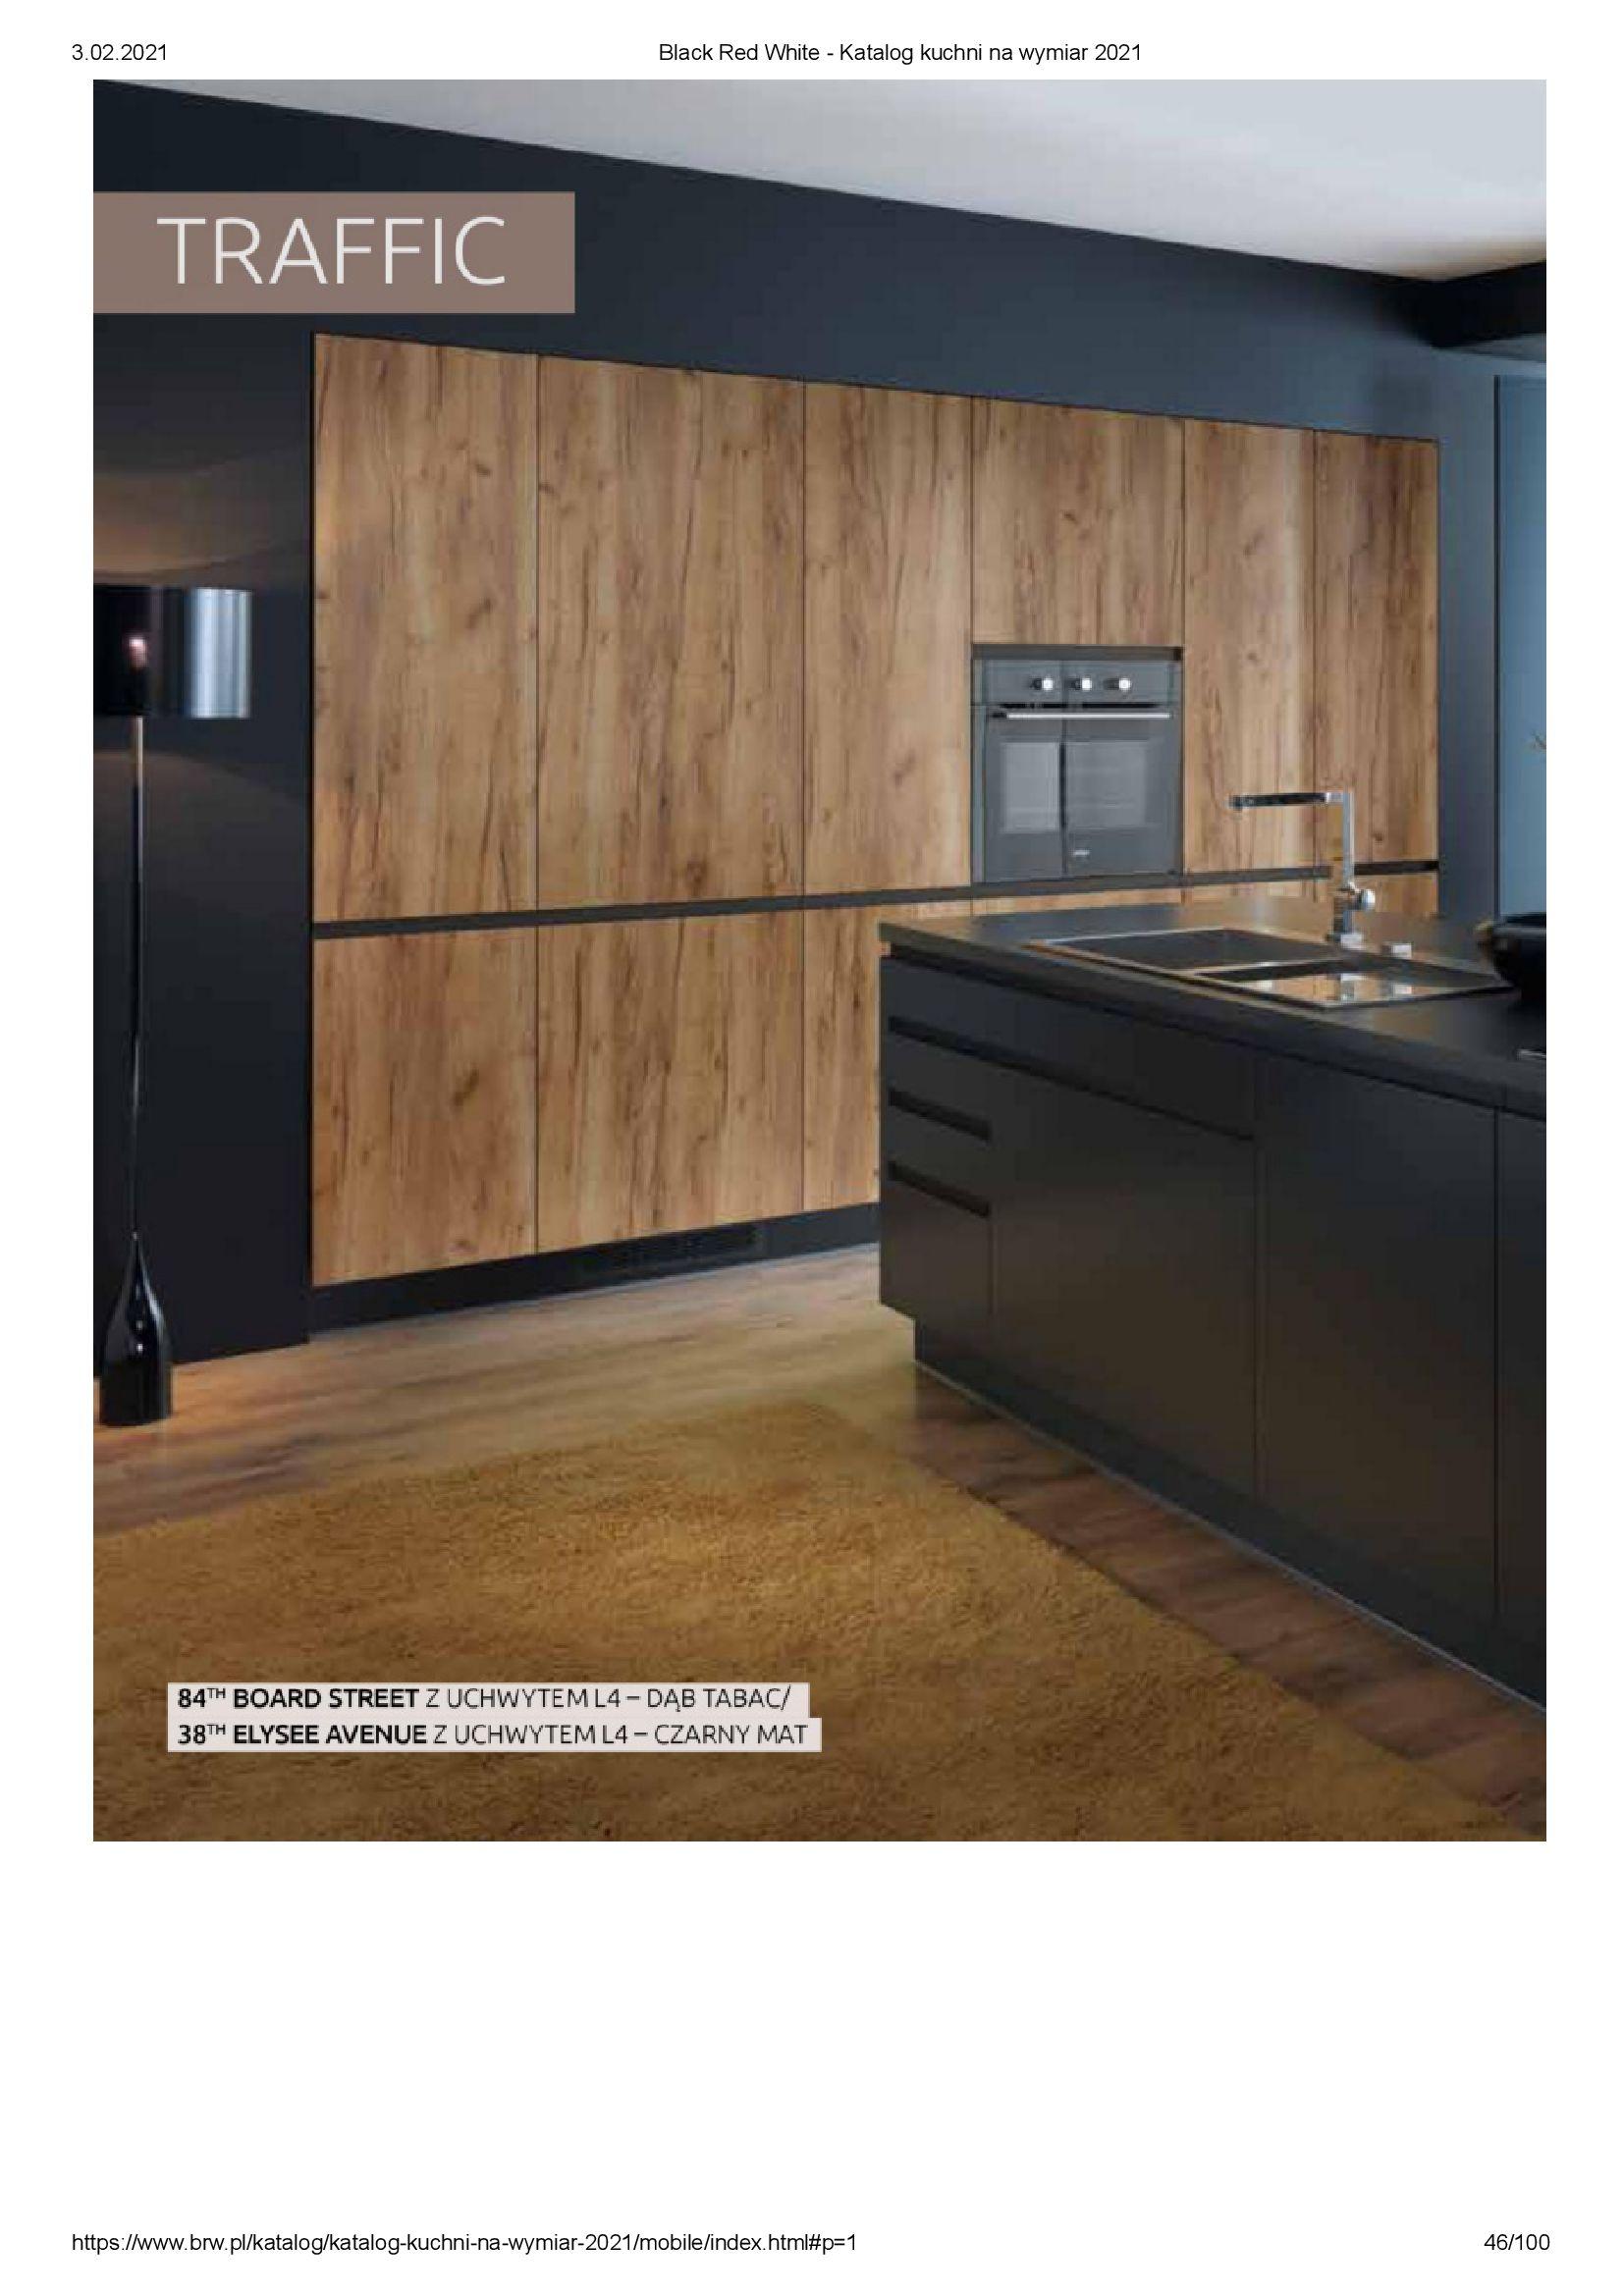 Gazetka Black Red White: Katalog - Kuchnie na wymiar Senso Kitchens 2021 2021-01-01 page-46